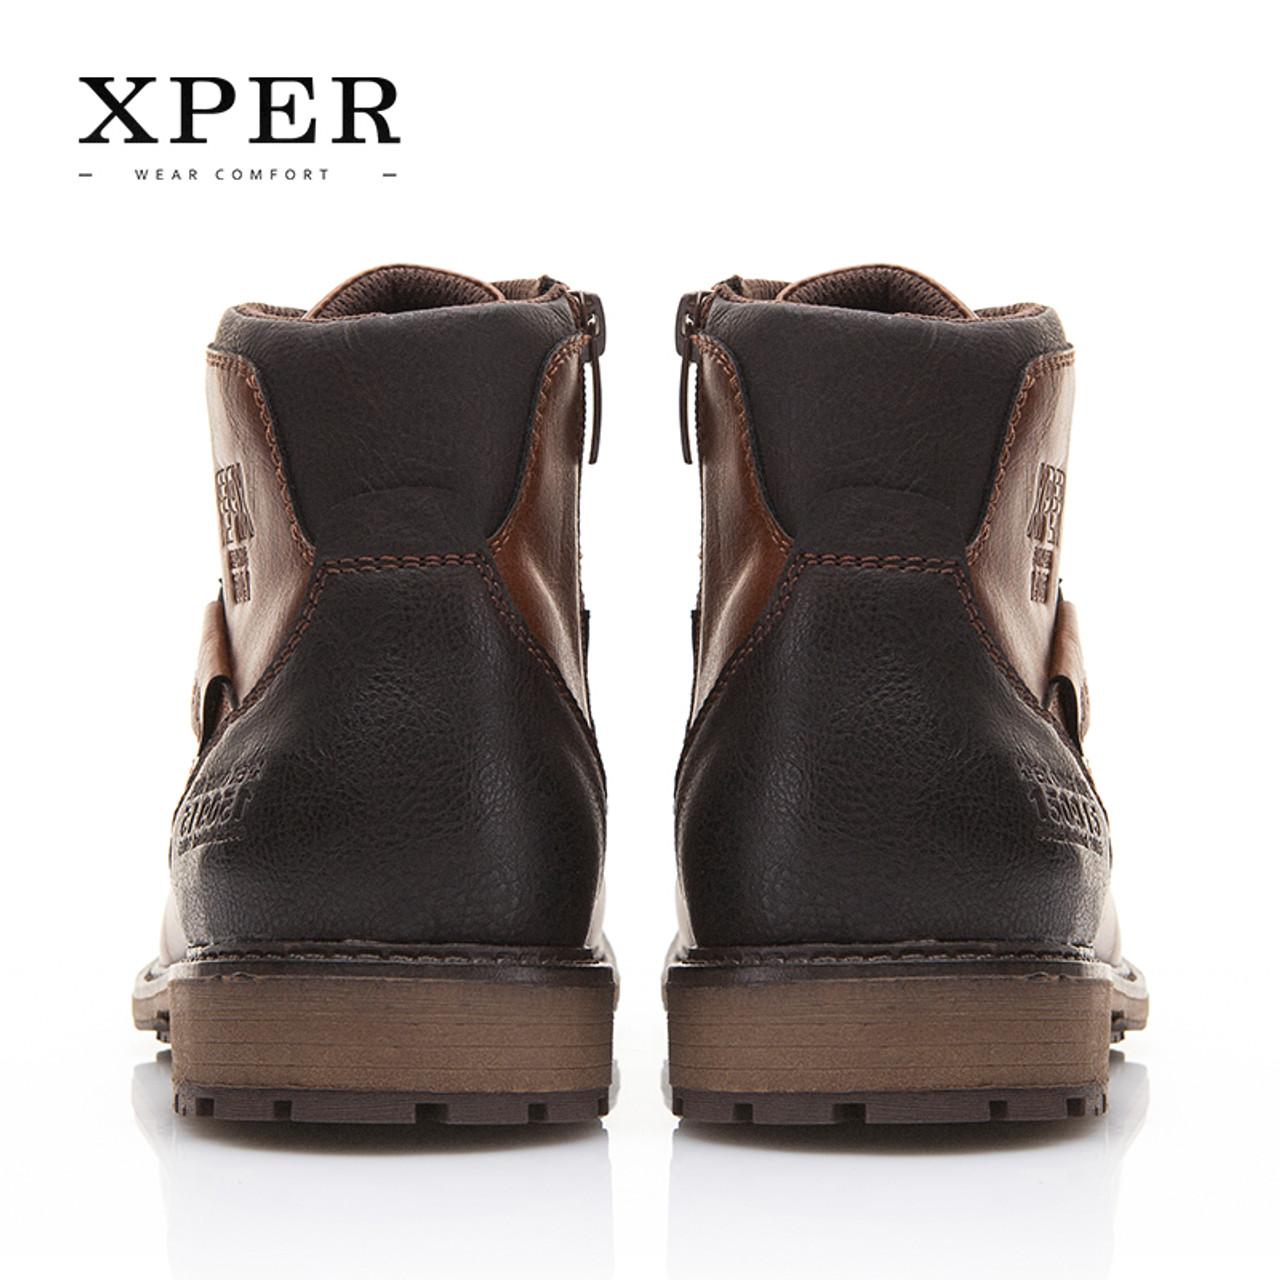 8ed574f69f274 XPER Autumn Winter Men Boots Big Size 40-48 Vintage Style Men Shoes Casual  Fashion High-Cut Lace-up Warm Hombre #XHY12504BR